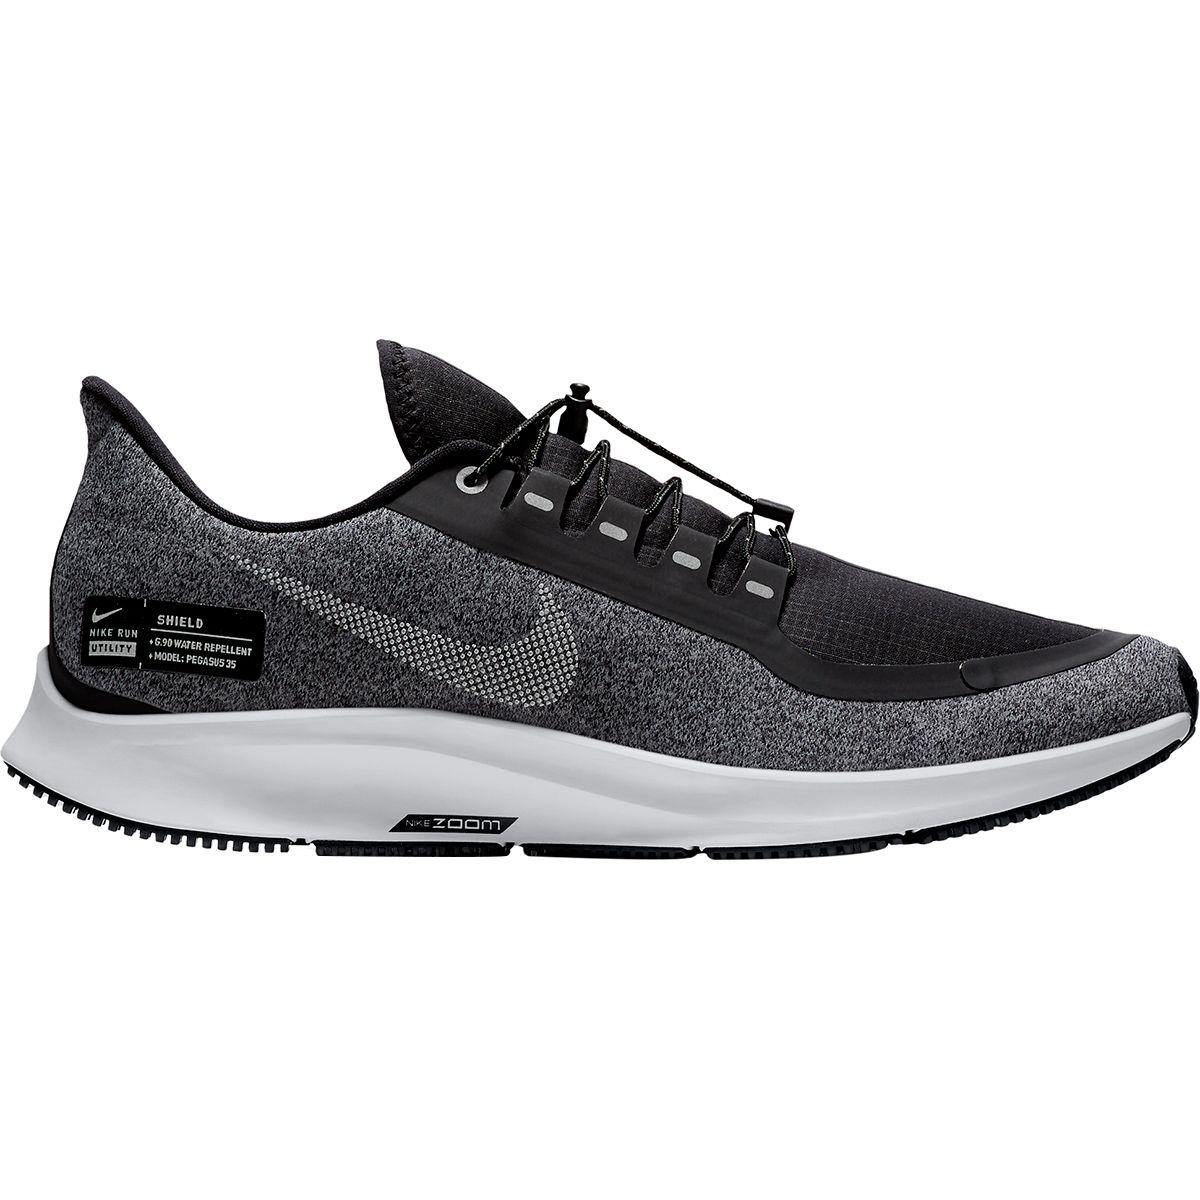 cfc666689fdd1 Lyst - Nike Air Zoom Pegasus 35 Shield Running Shoe in Gray for Men